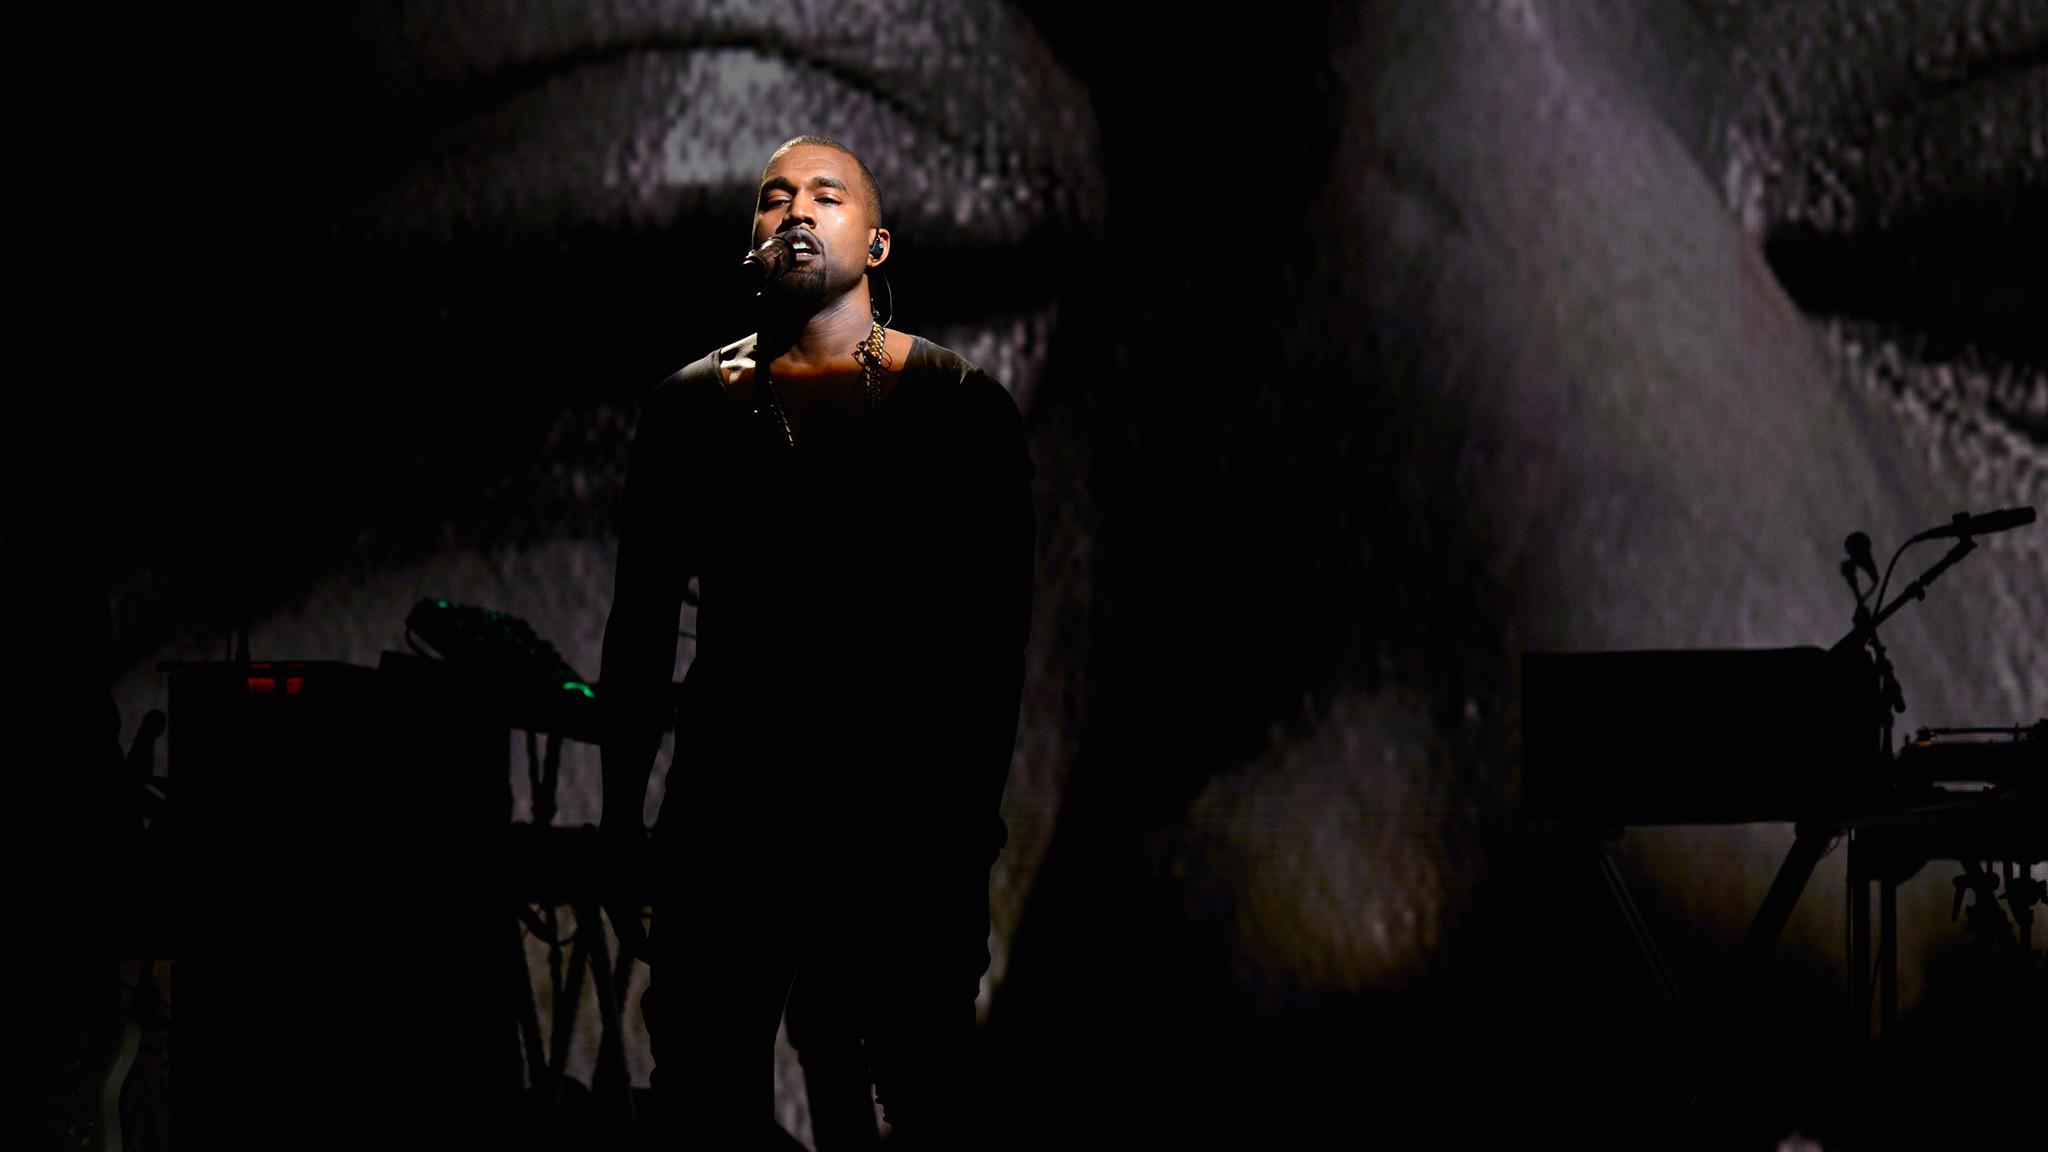 Kanye West to headline Austin's X Games this summer | Bad ... Kanye West Texas